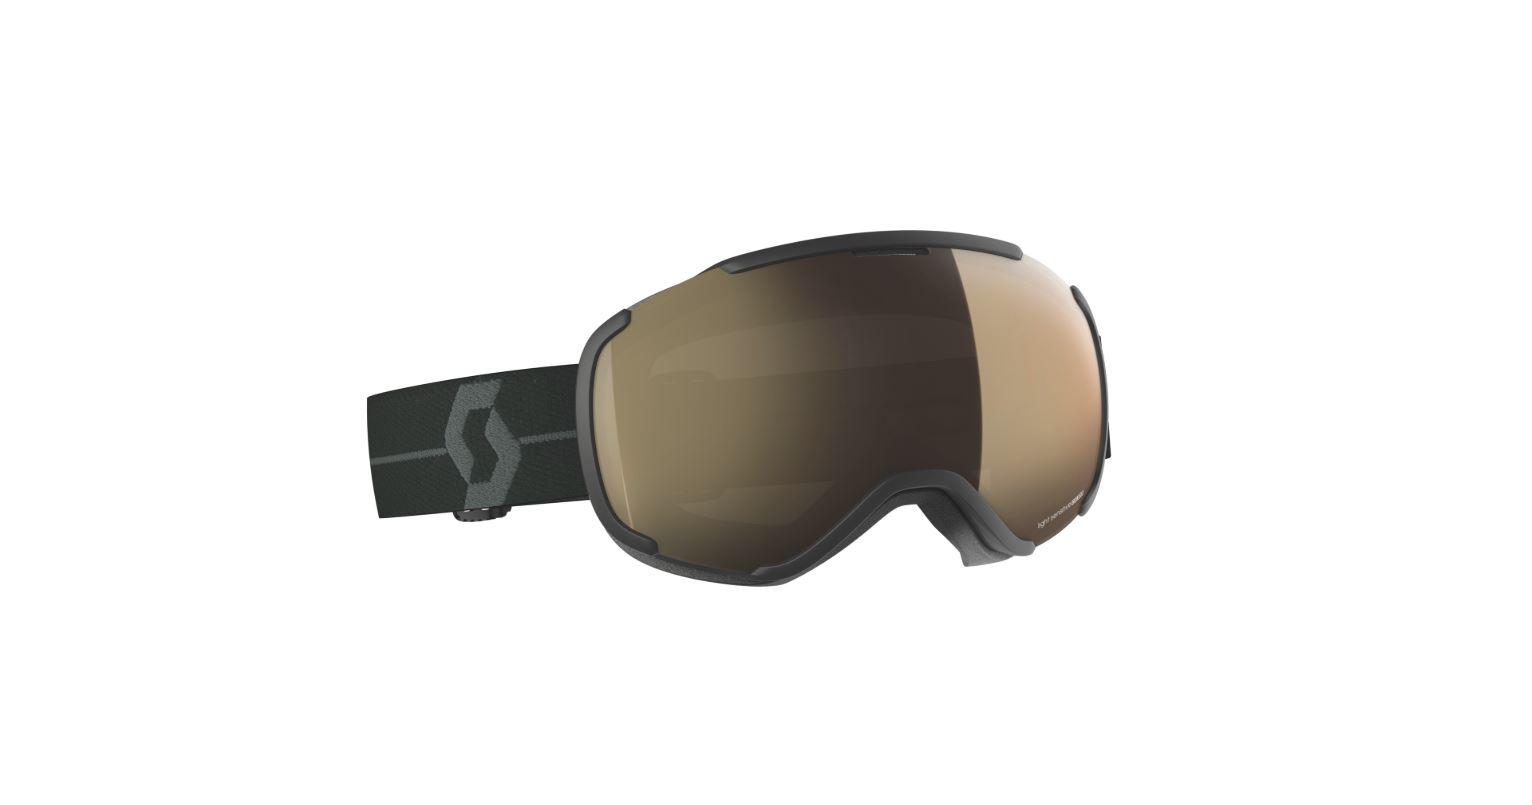 fcb2dc583920 Scott Faze II Light Sensitive Snow Sports Goggles (Black  Grey Bronze Chrome)  – Cat 1-3